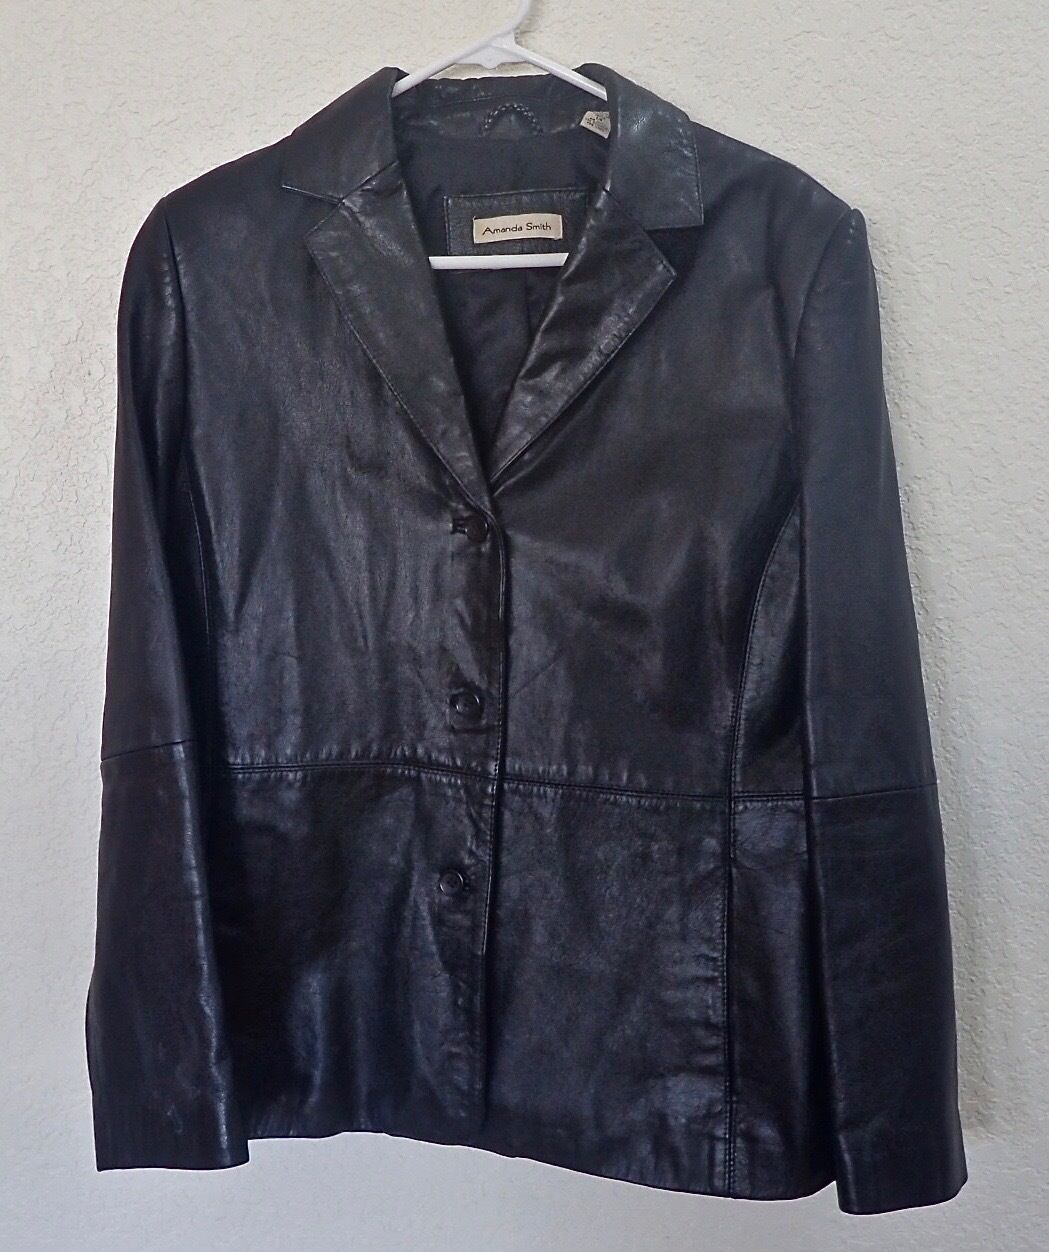 Amanda Smith Jacket Woman's Black Leather Size 14 KZ0497